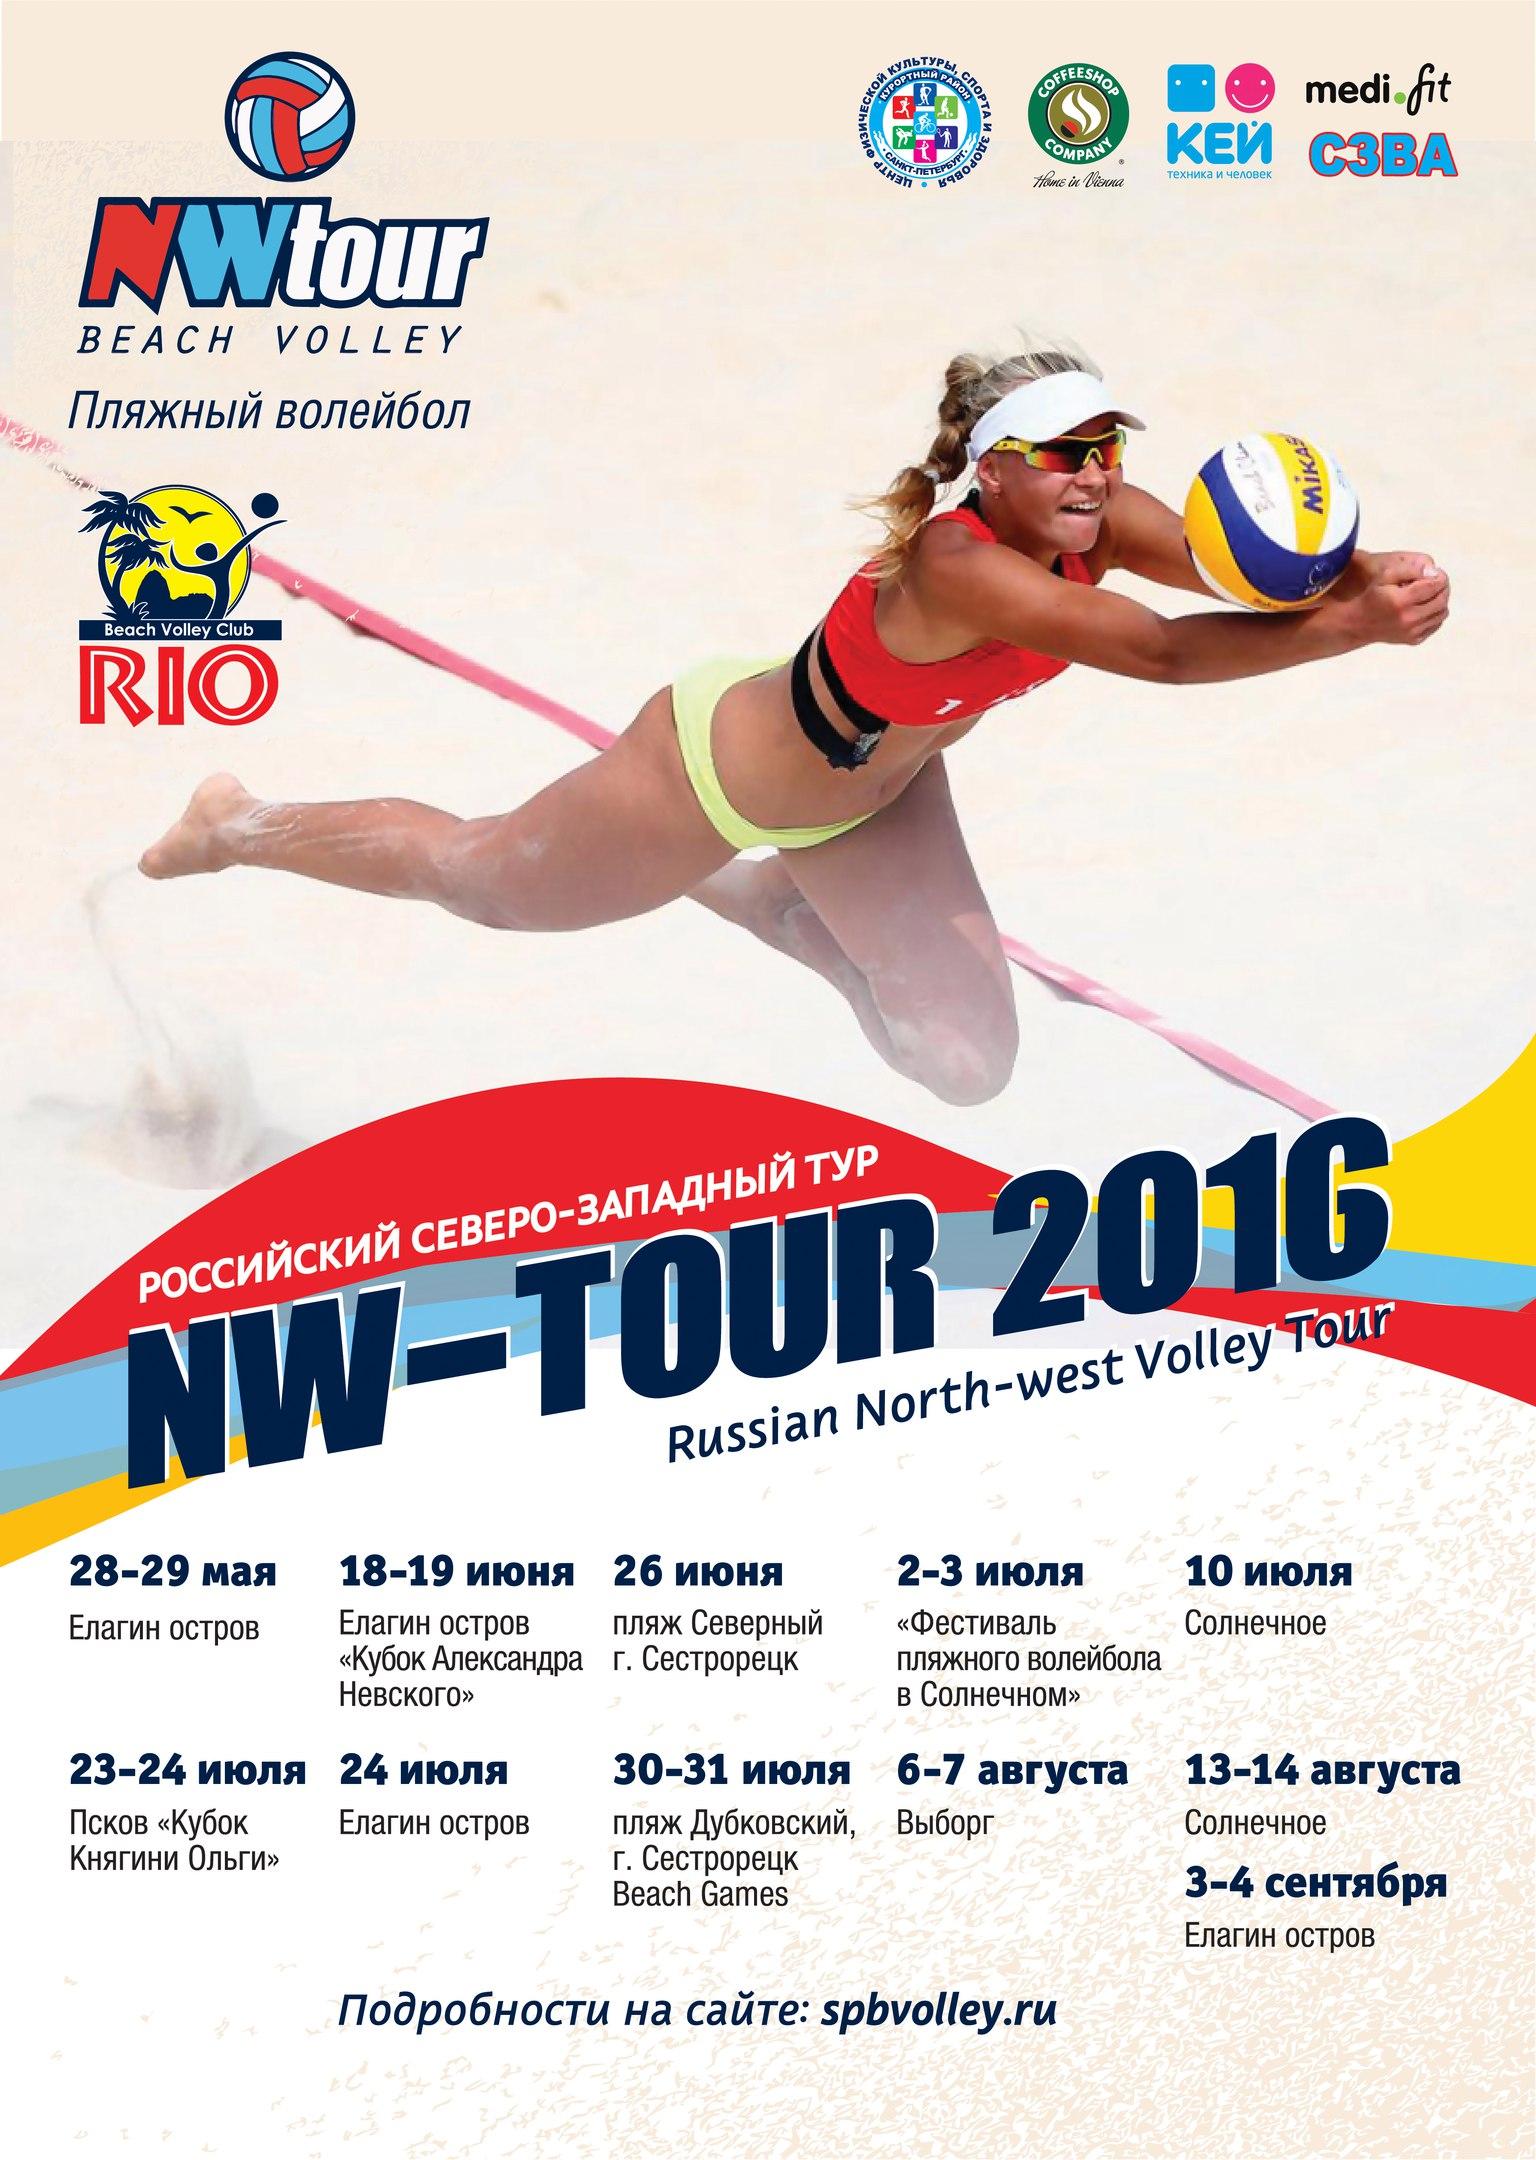 Афиша серии турниров NW Tour 2016